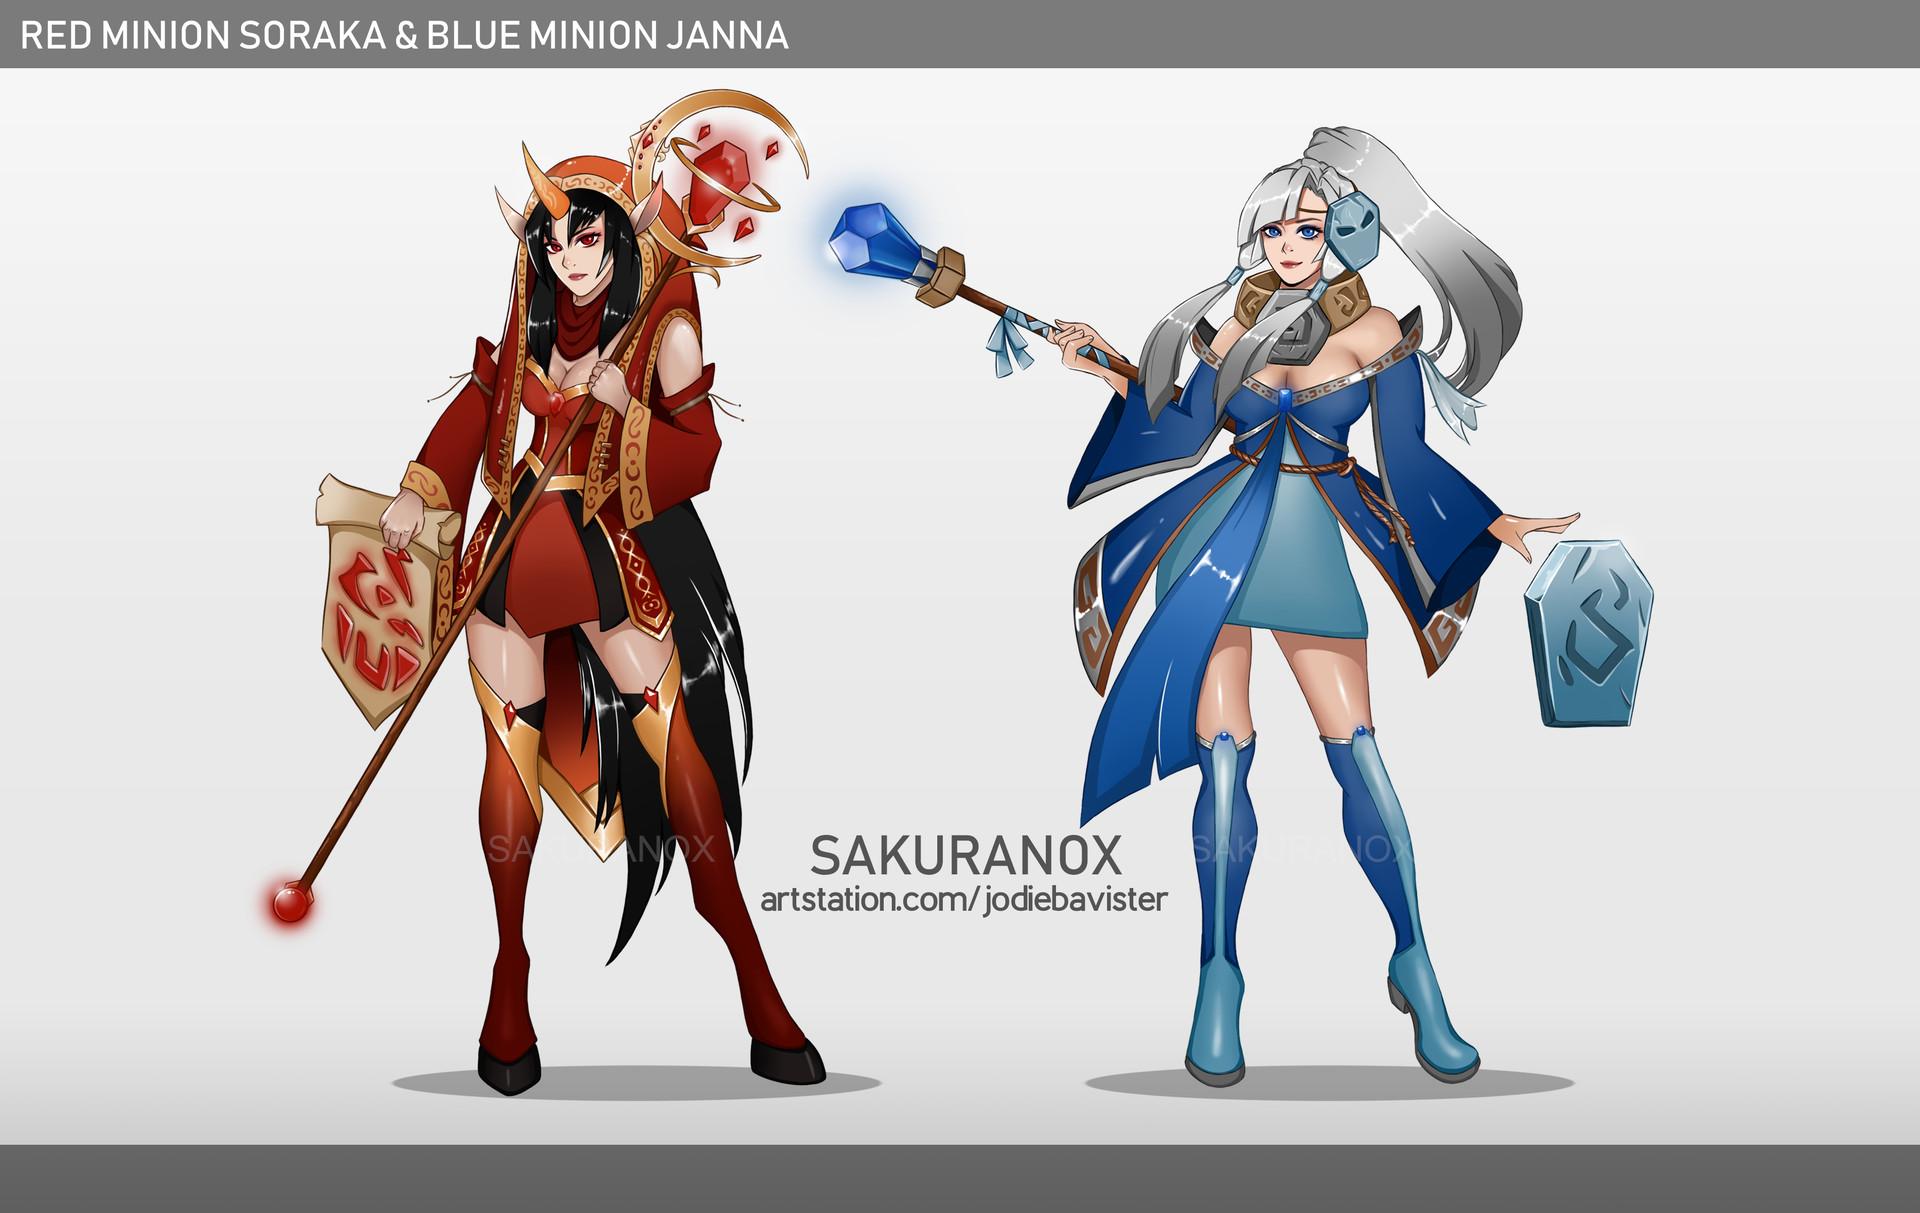 ArtStation - League of Legends Minion Skins Concept: Red